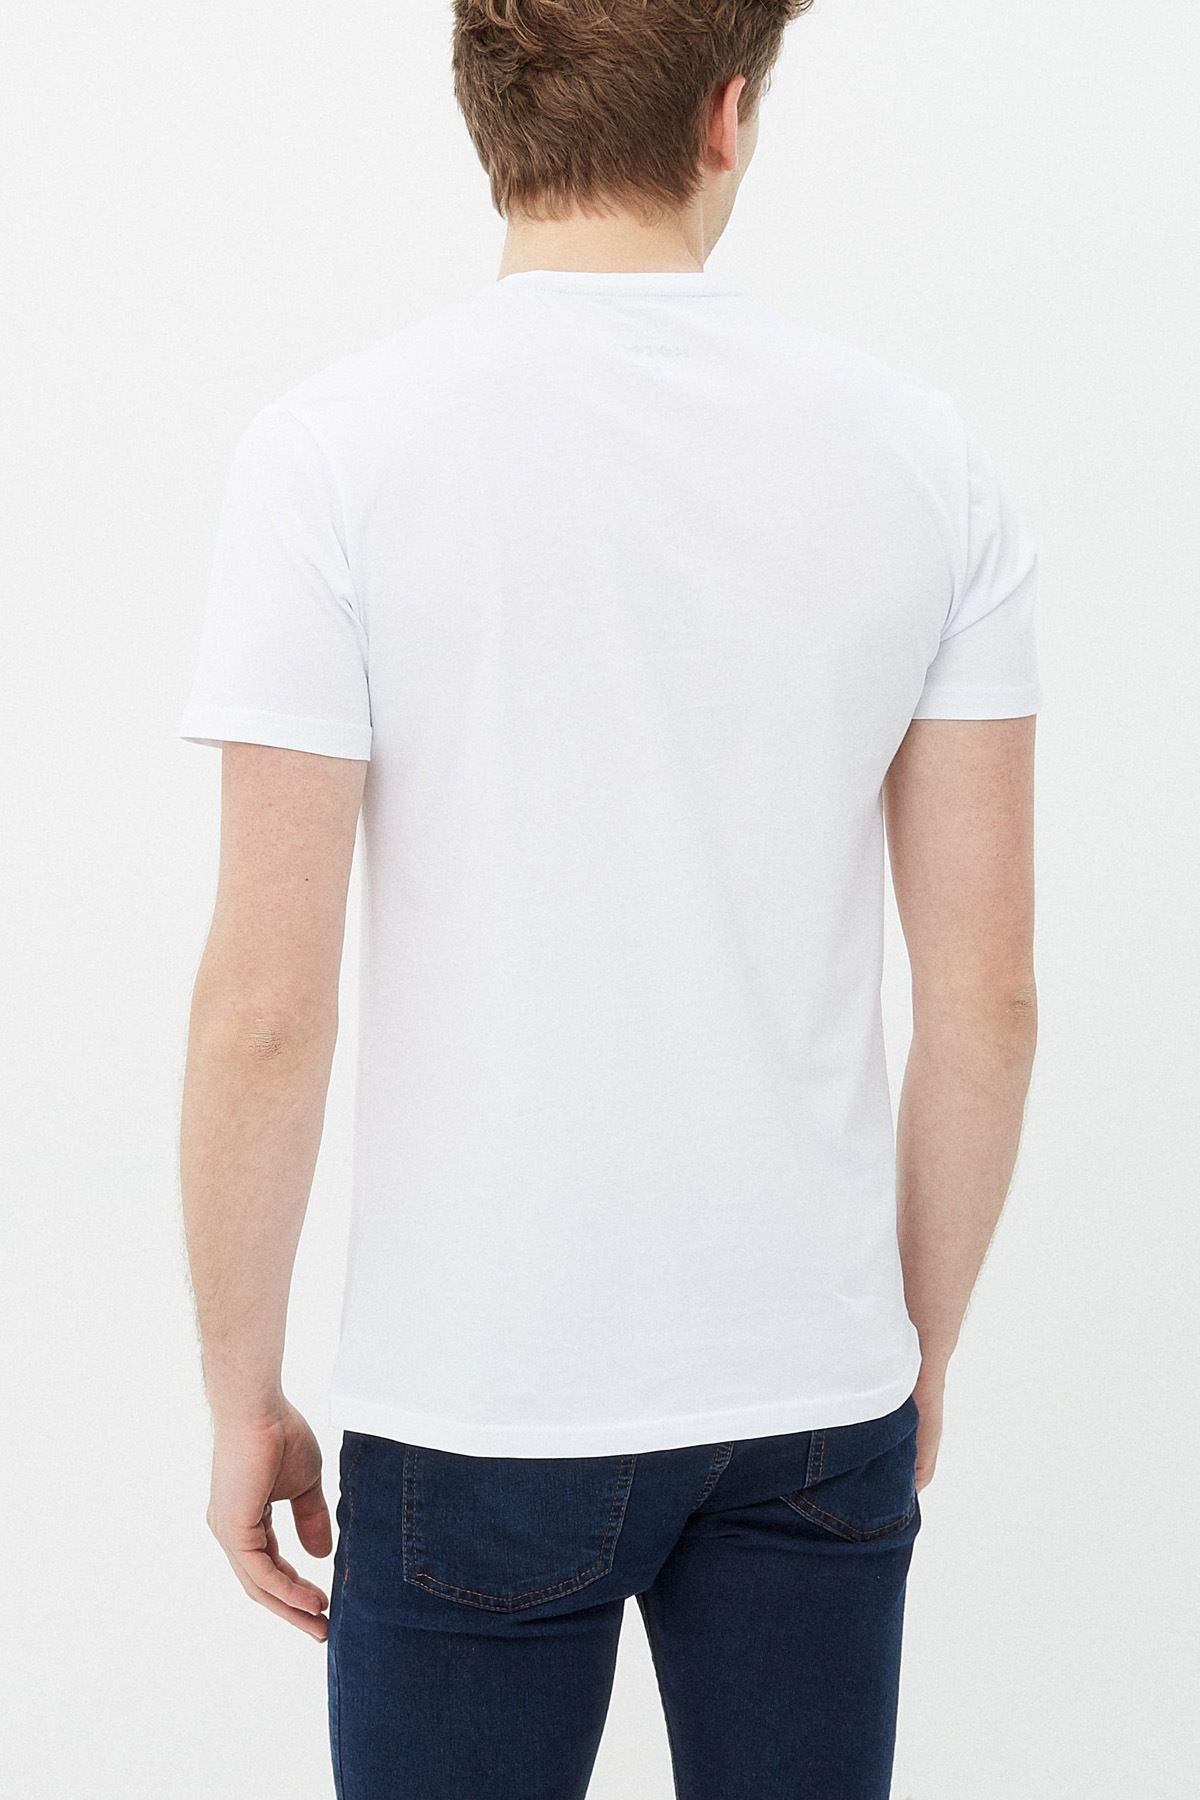 Anime Bang Beyaz Erkek Tshirt - Tişört